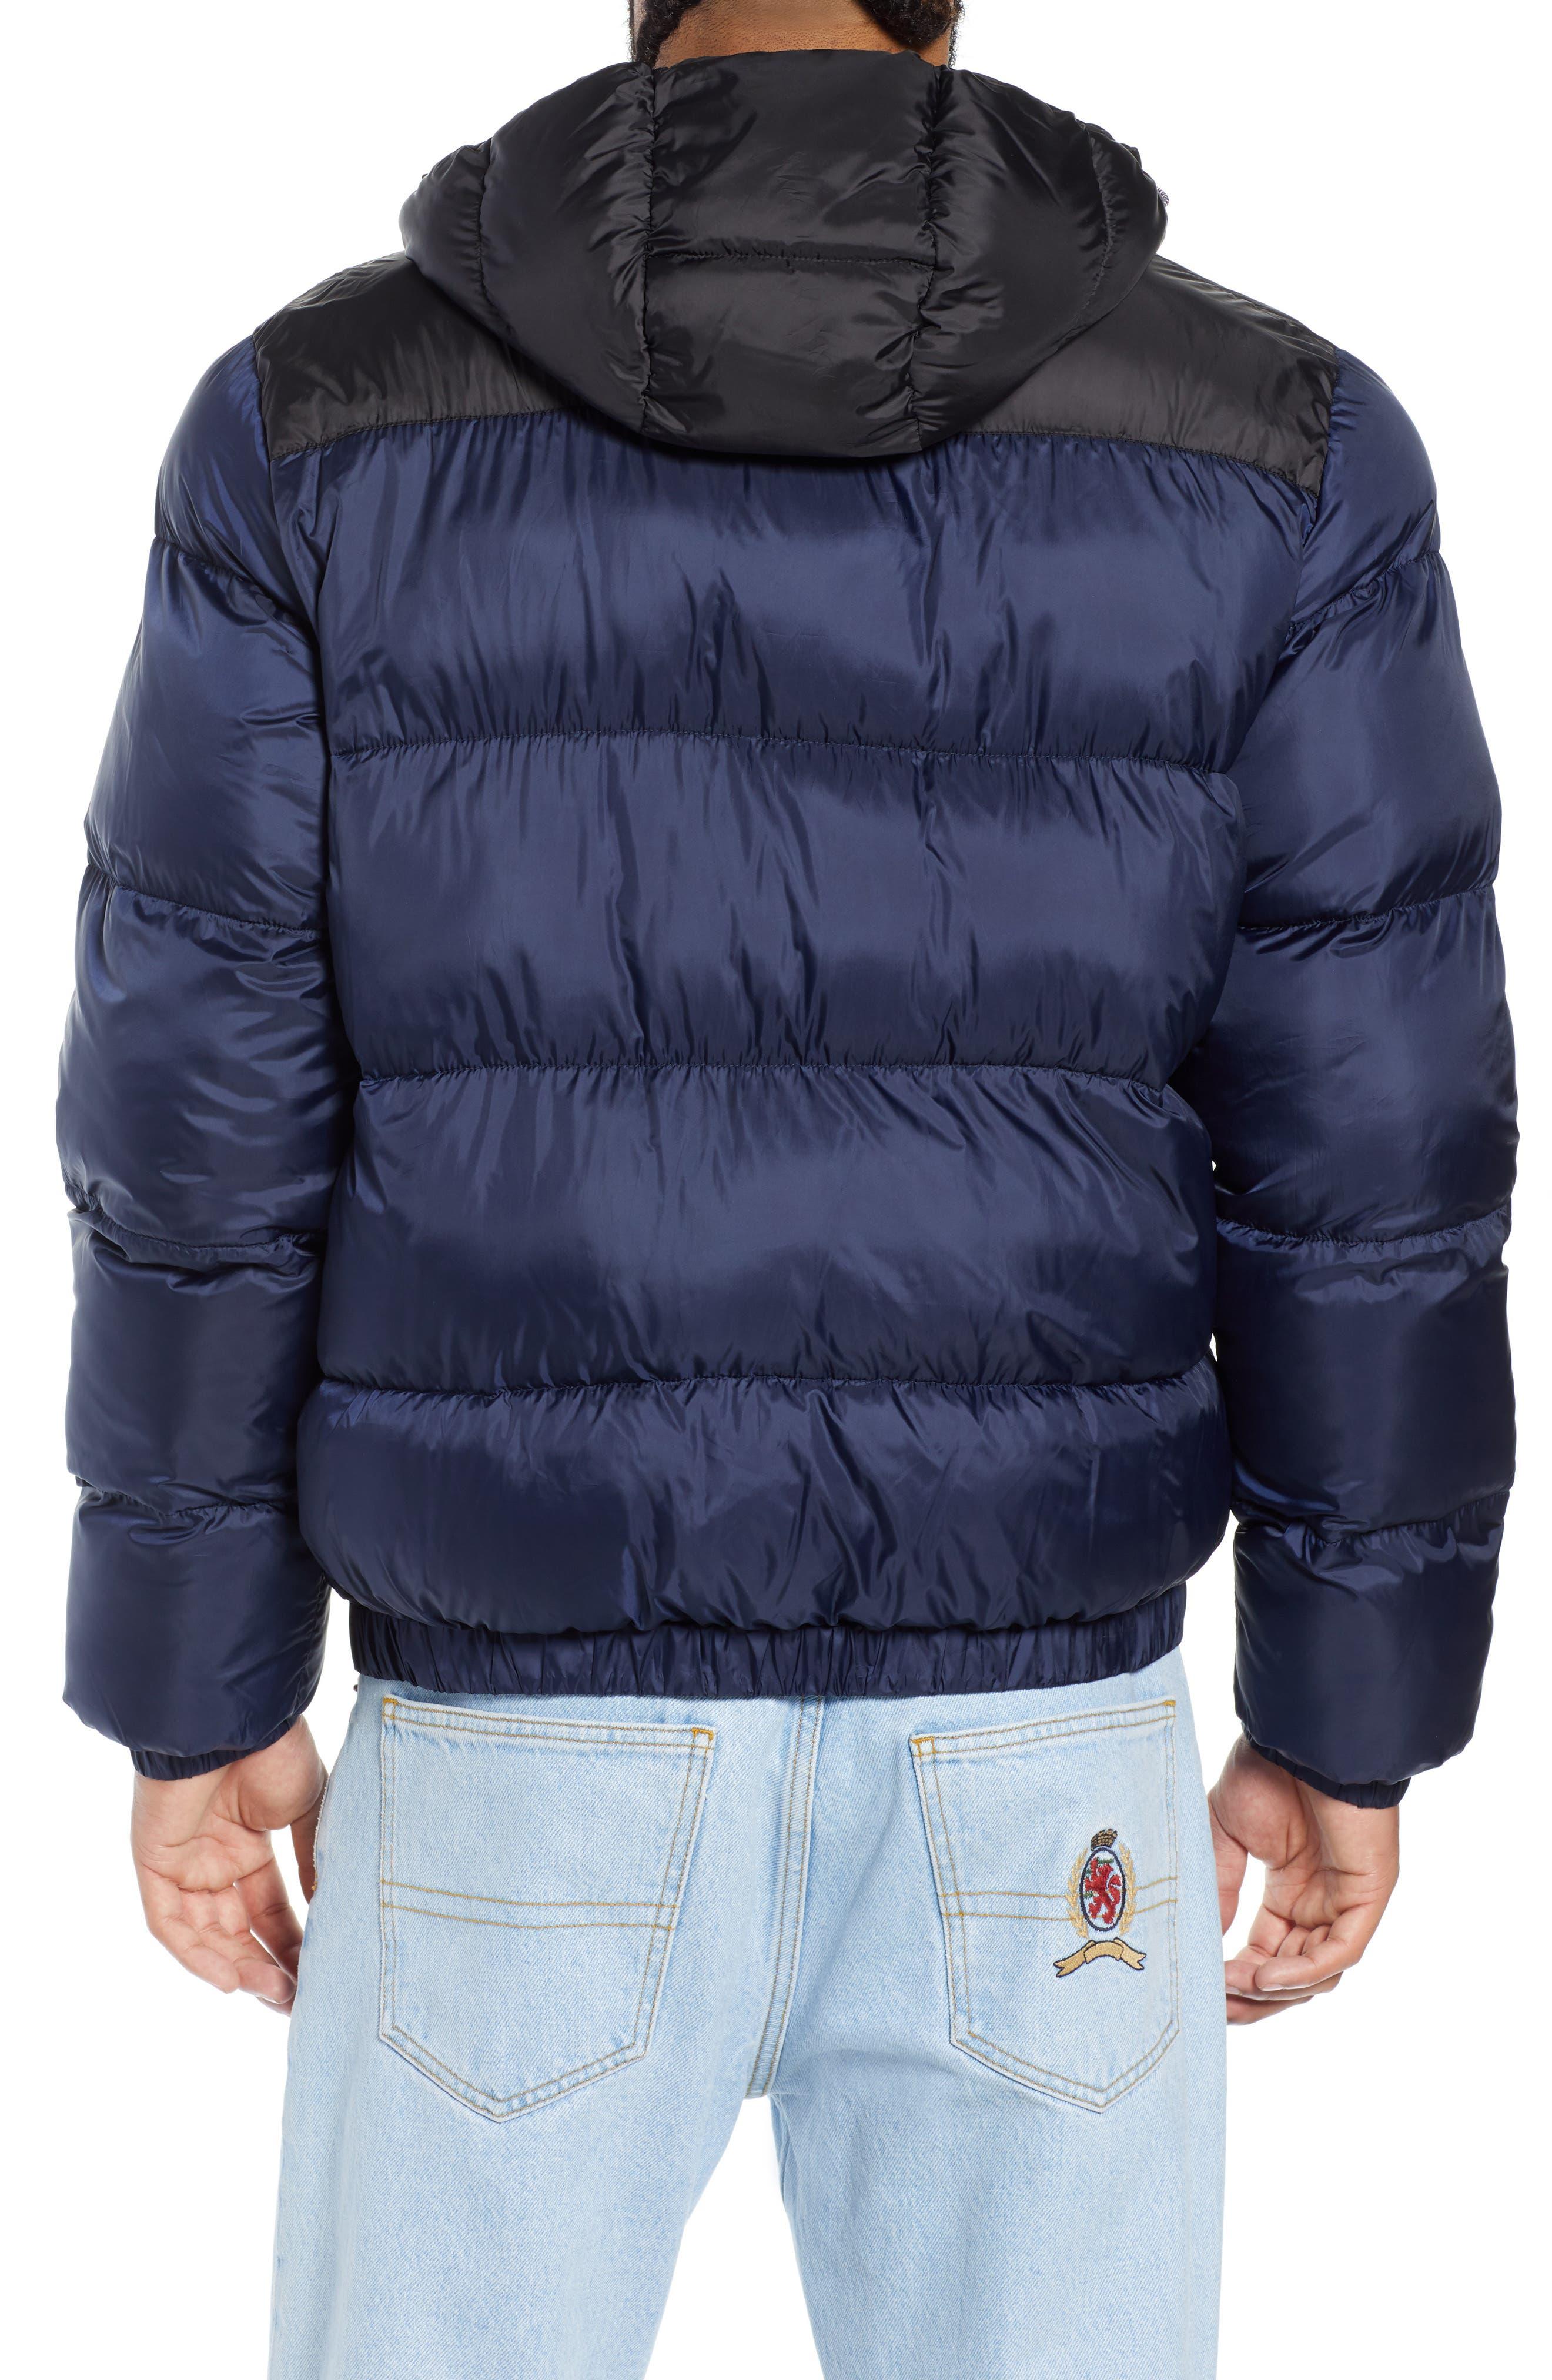 Classics Hooded Jacket,                             Alternate thumbnail 2, color,                             400